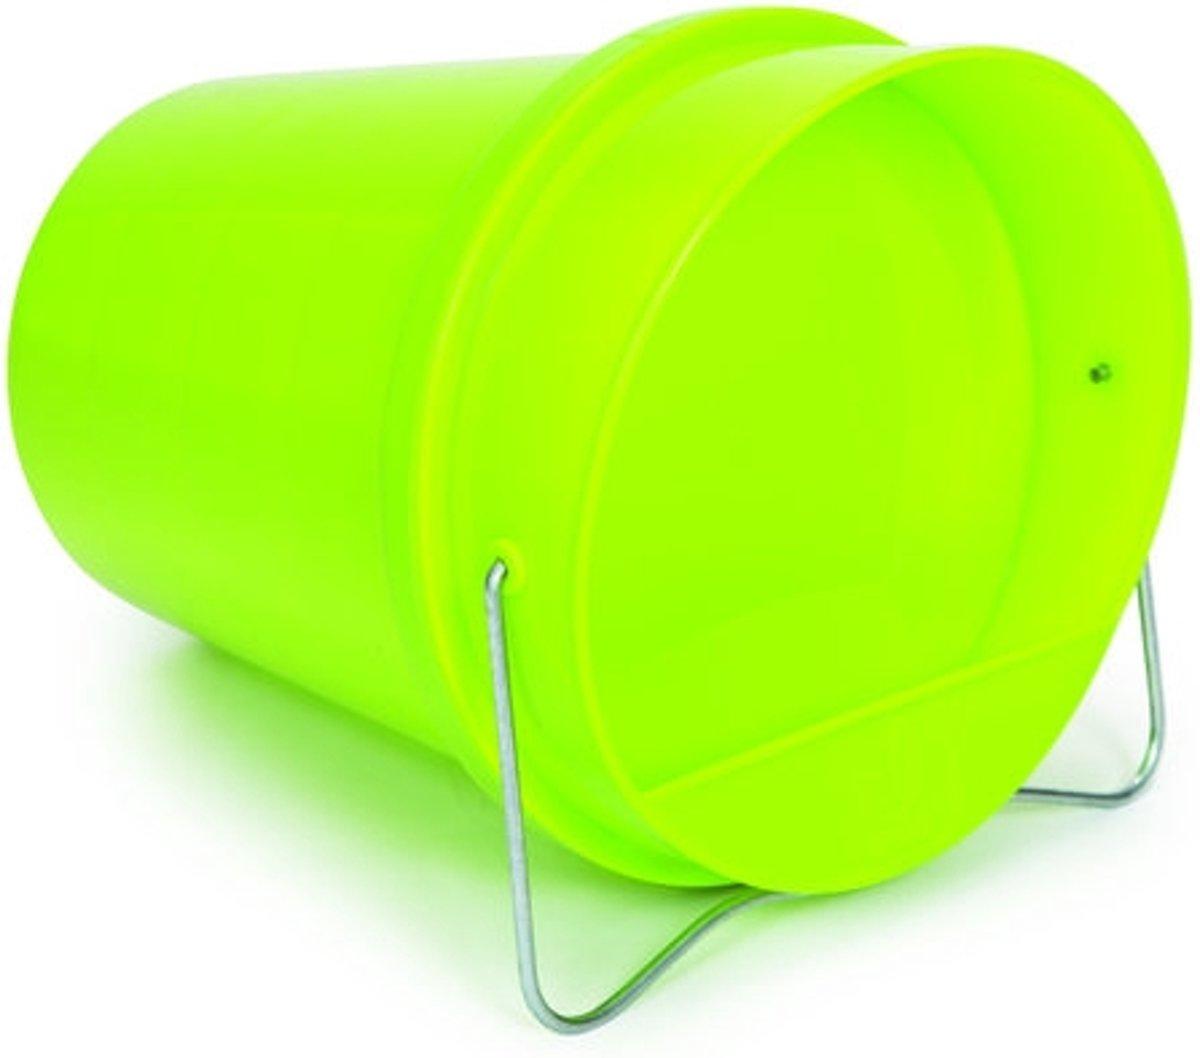 Gaun drinkemmer kip plastic groen 6L